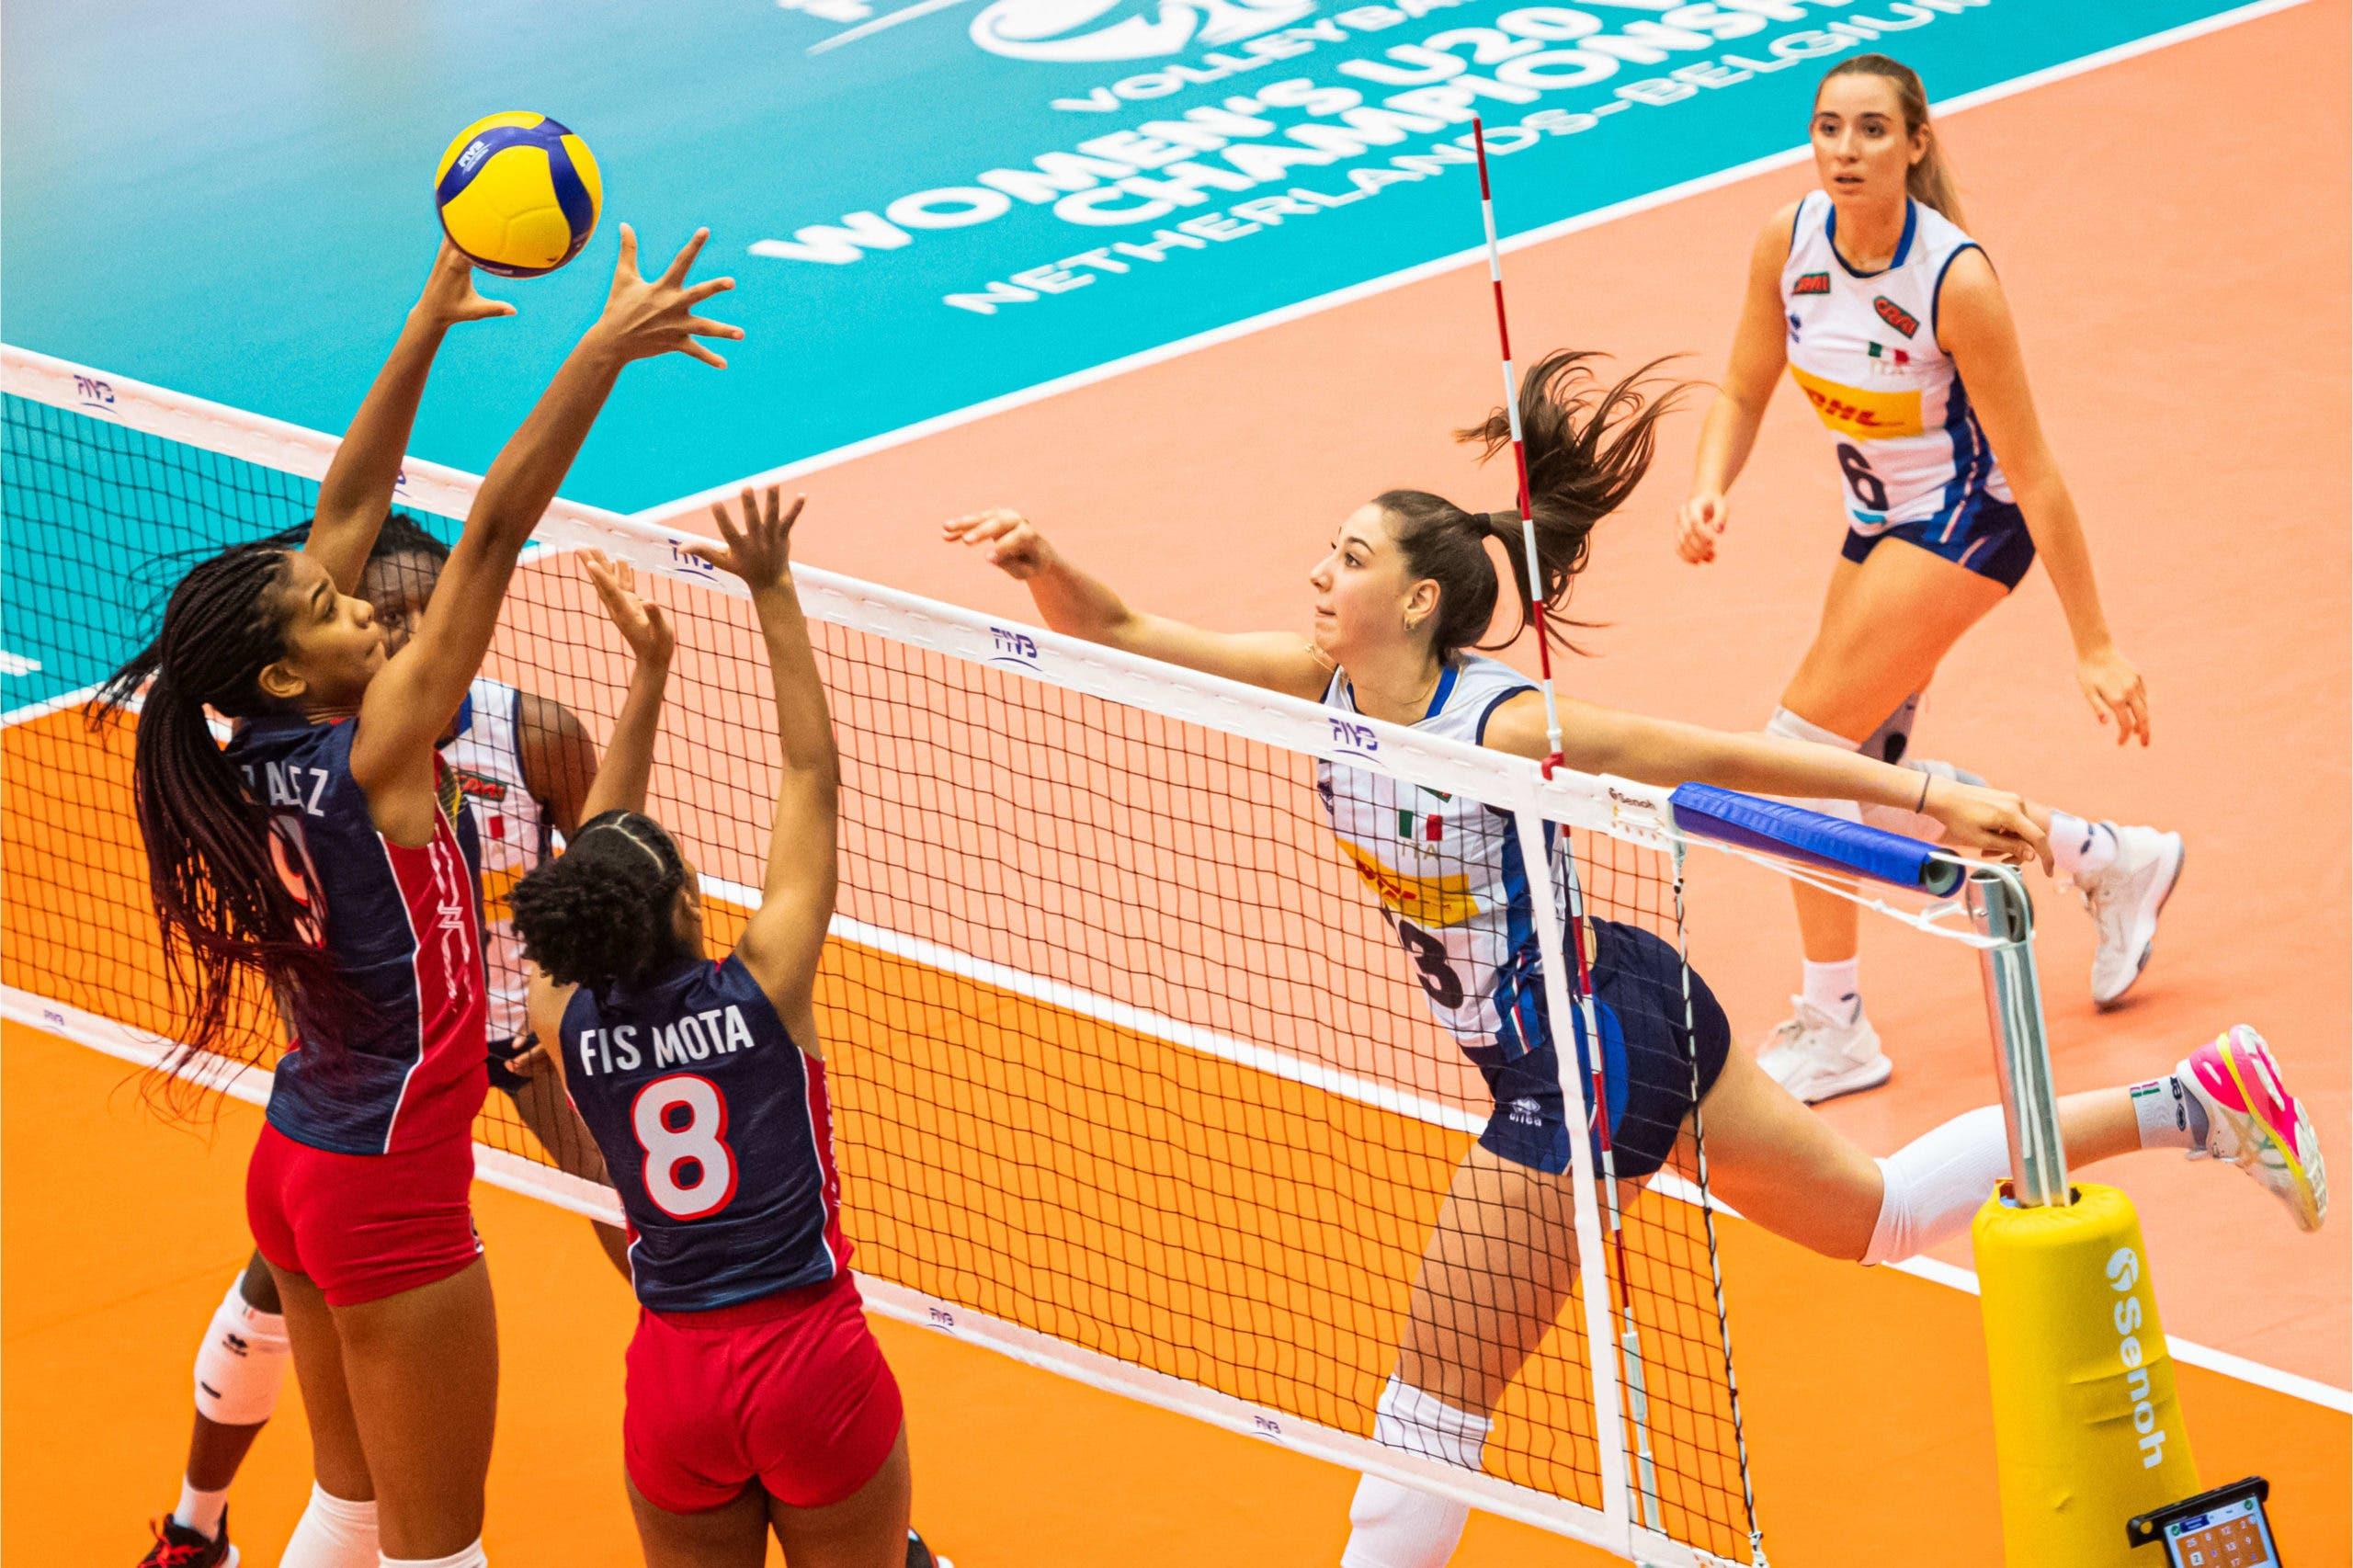 Italia vence 3-0 a República Dominicana en Mundial de Voleibol Femenino Sub-20